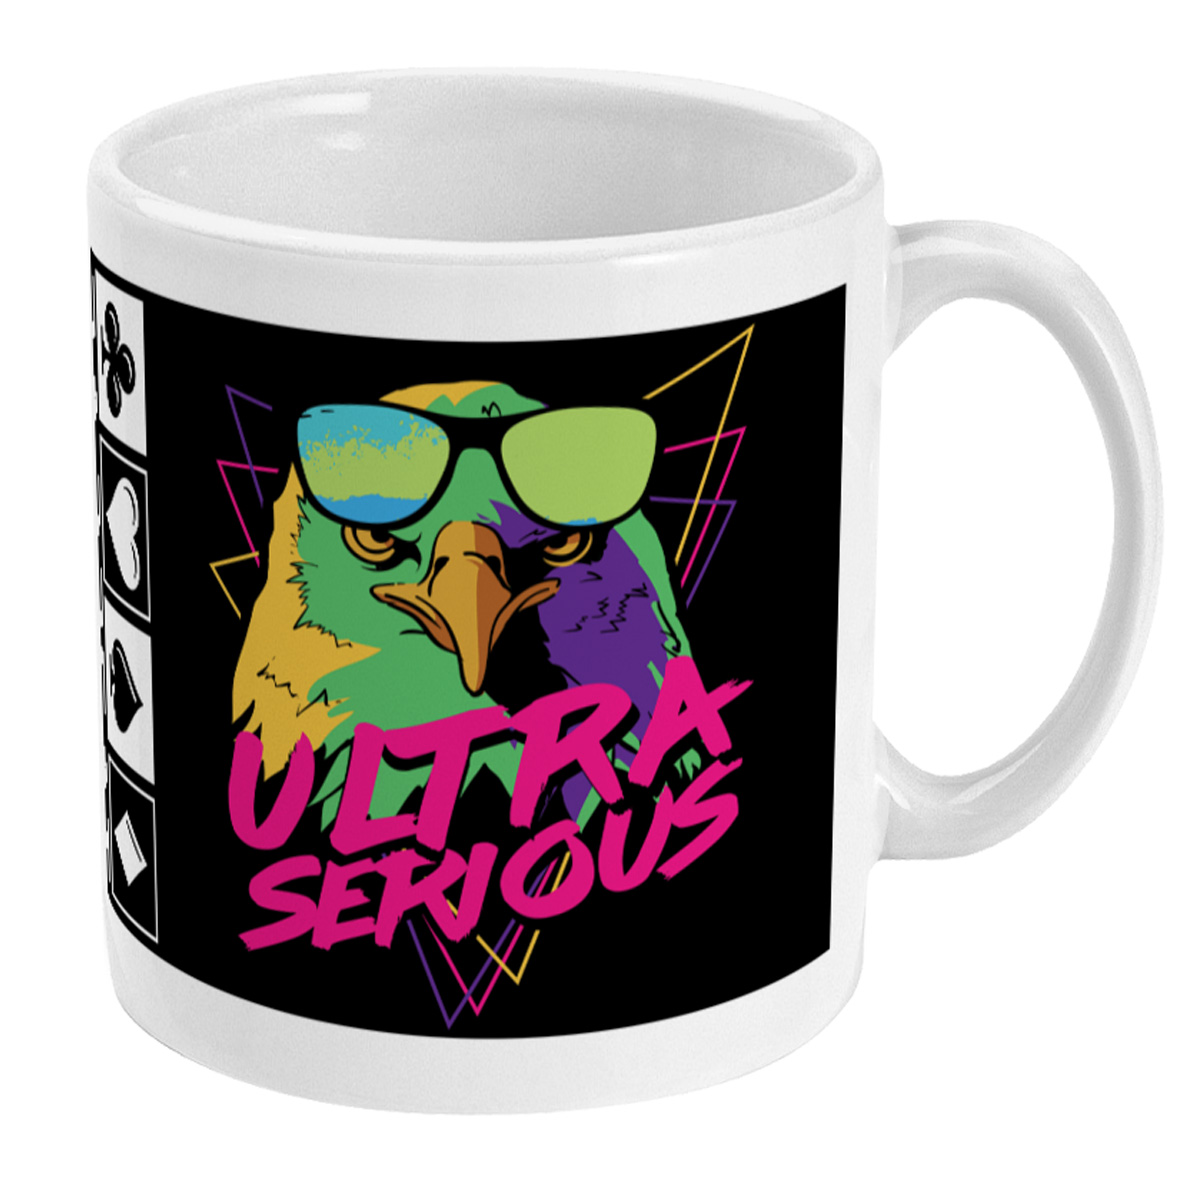 Ultra Serious About Poker Mug - Right